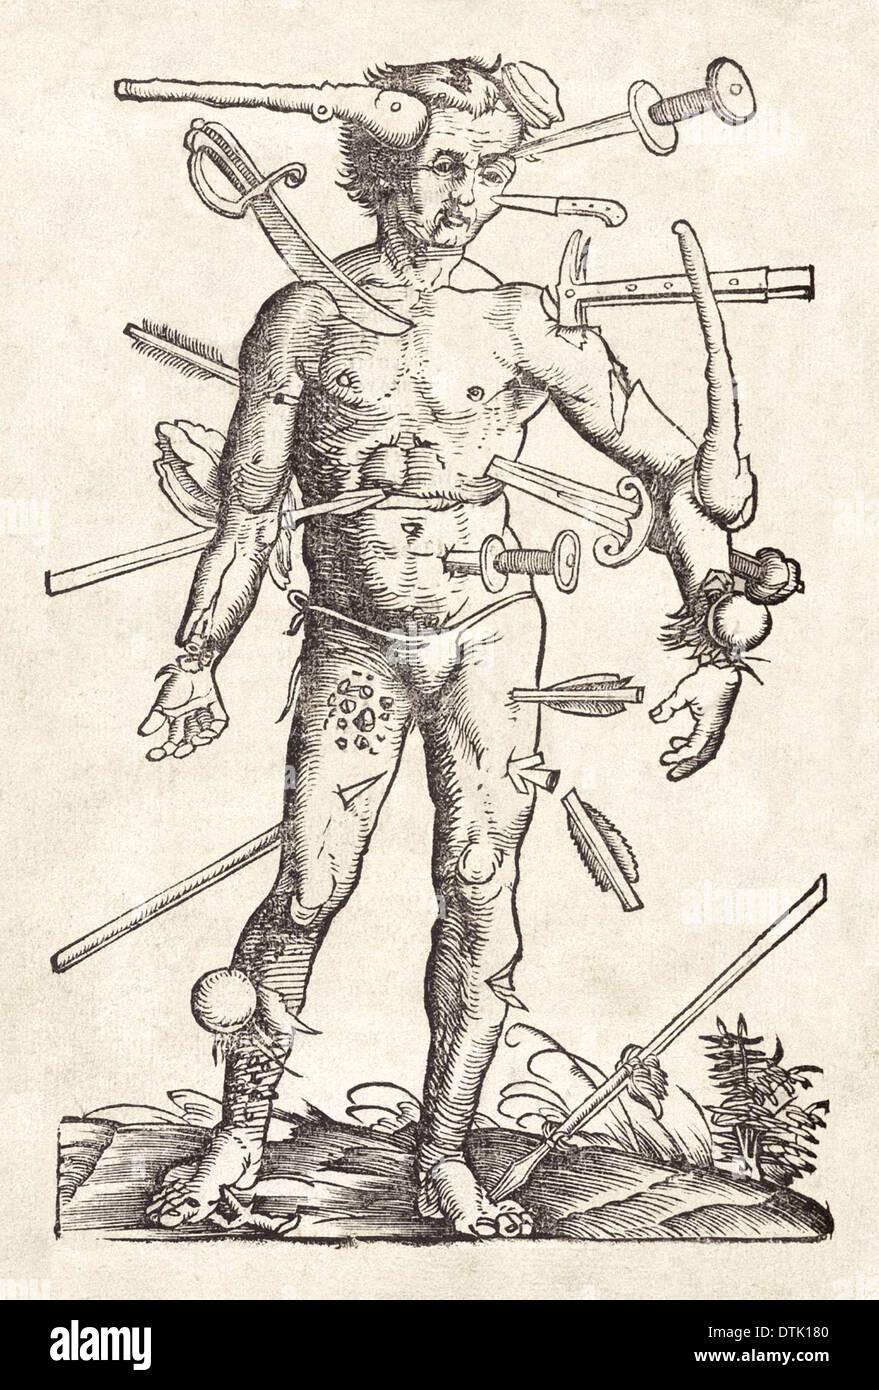 Uomo avvolto xilografia attribuito a Hans Wechtlin dal chirurgo tedesco Hans von Gersdorff del libro del campo della Immagini Stock